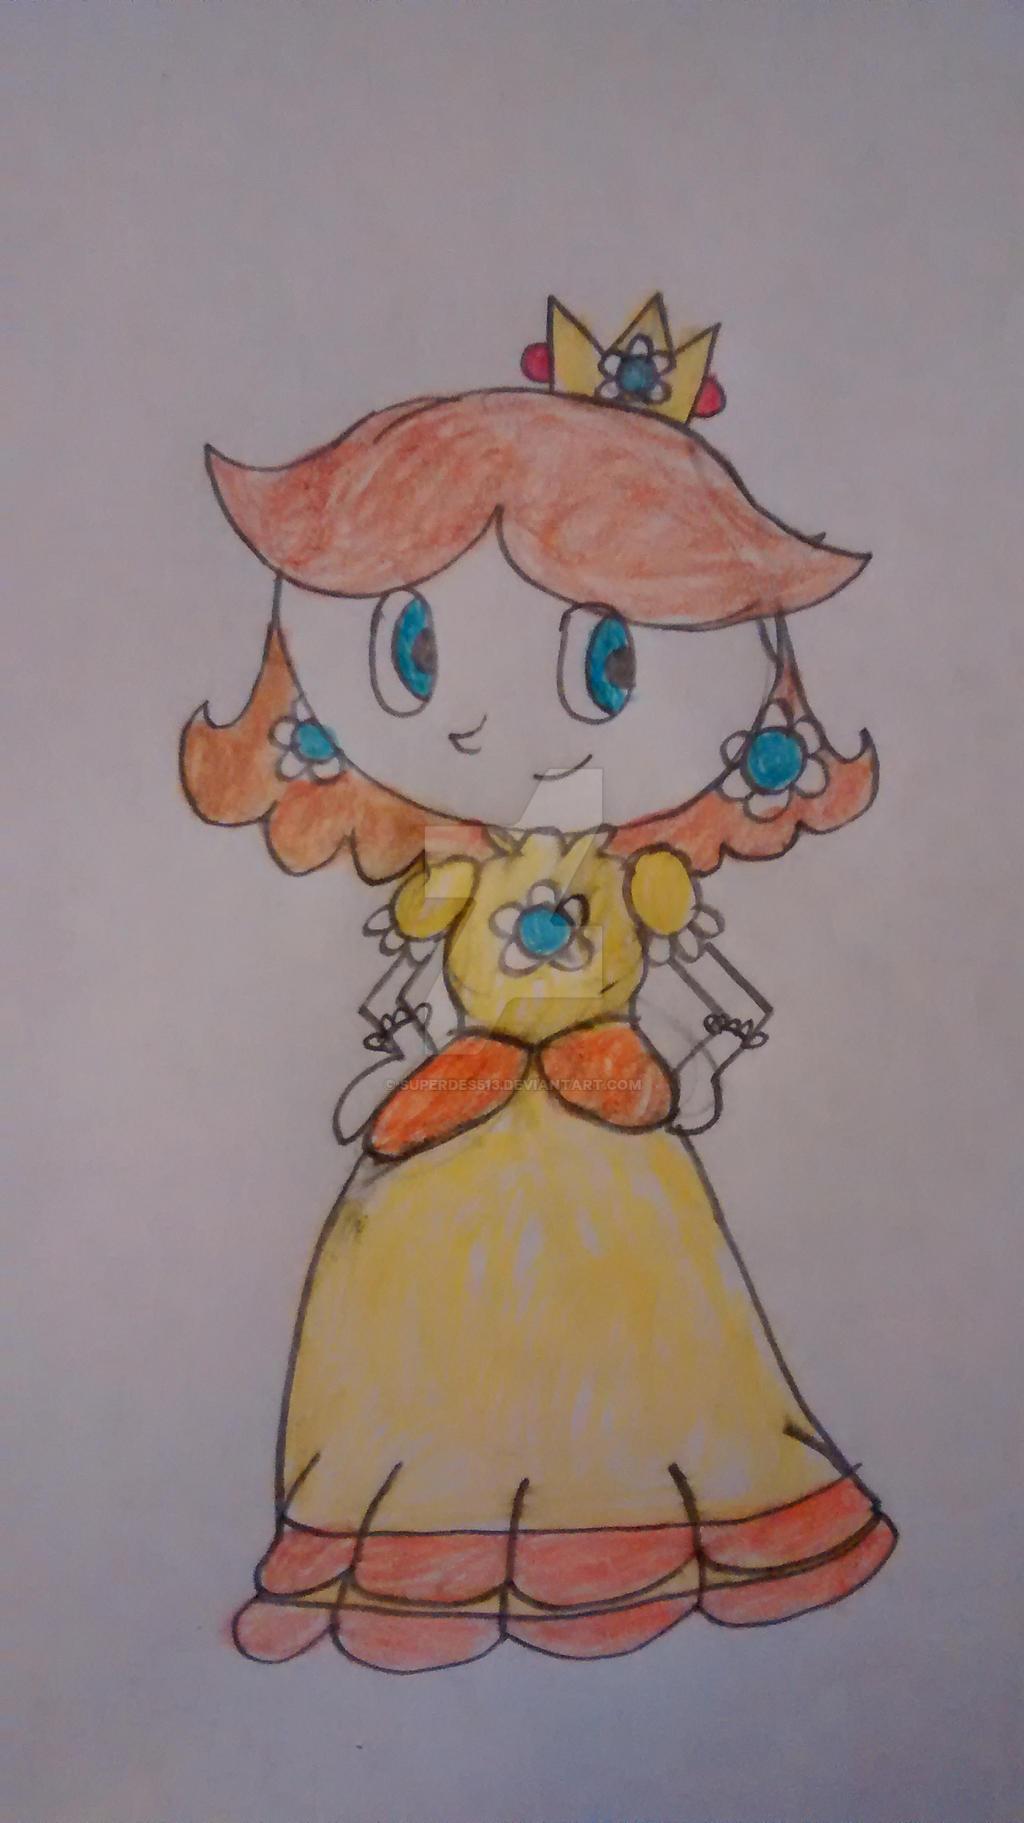 Princess Daisy by superdes513